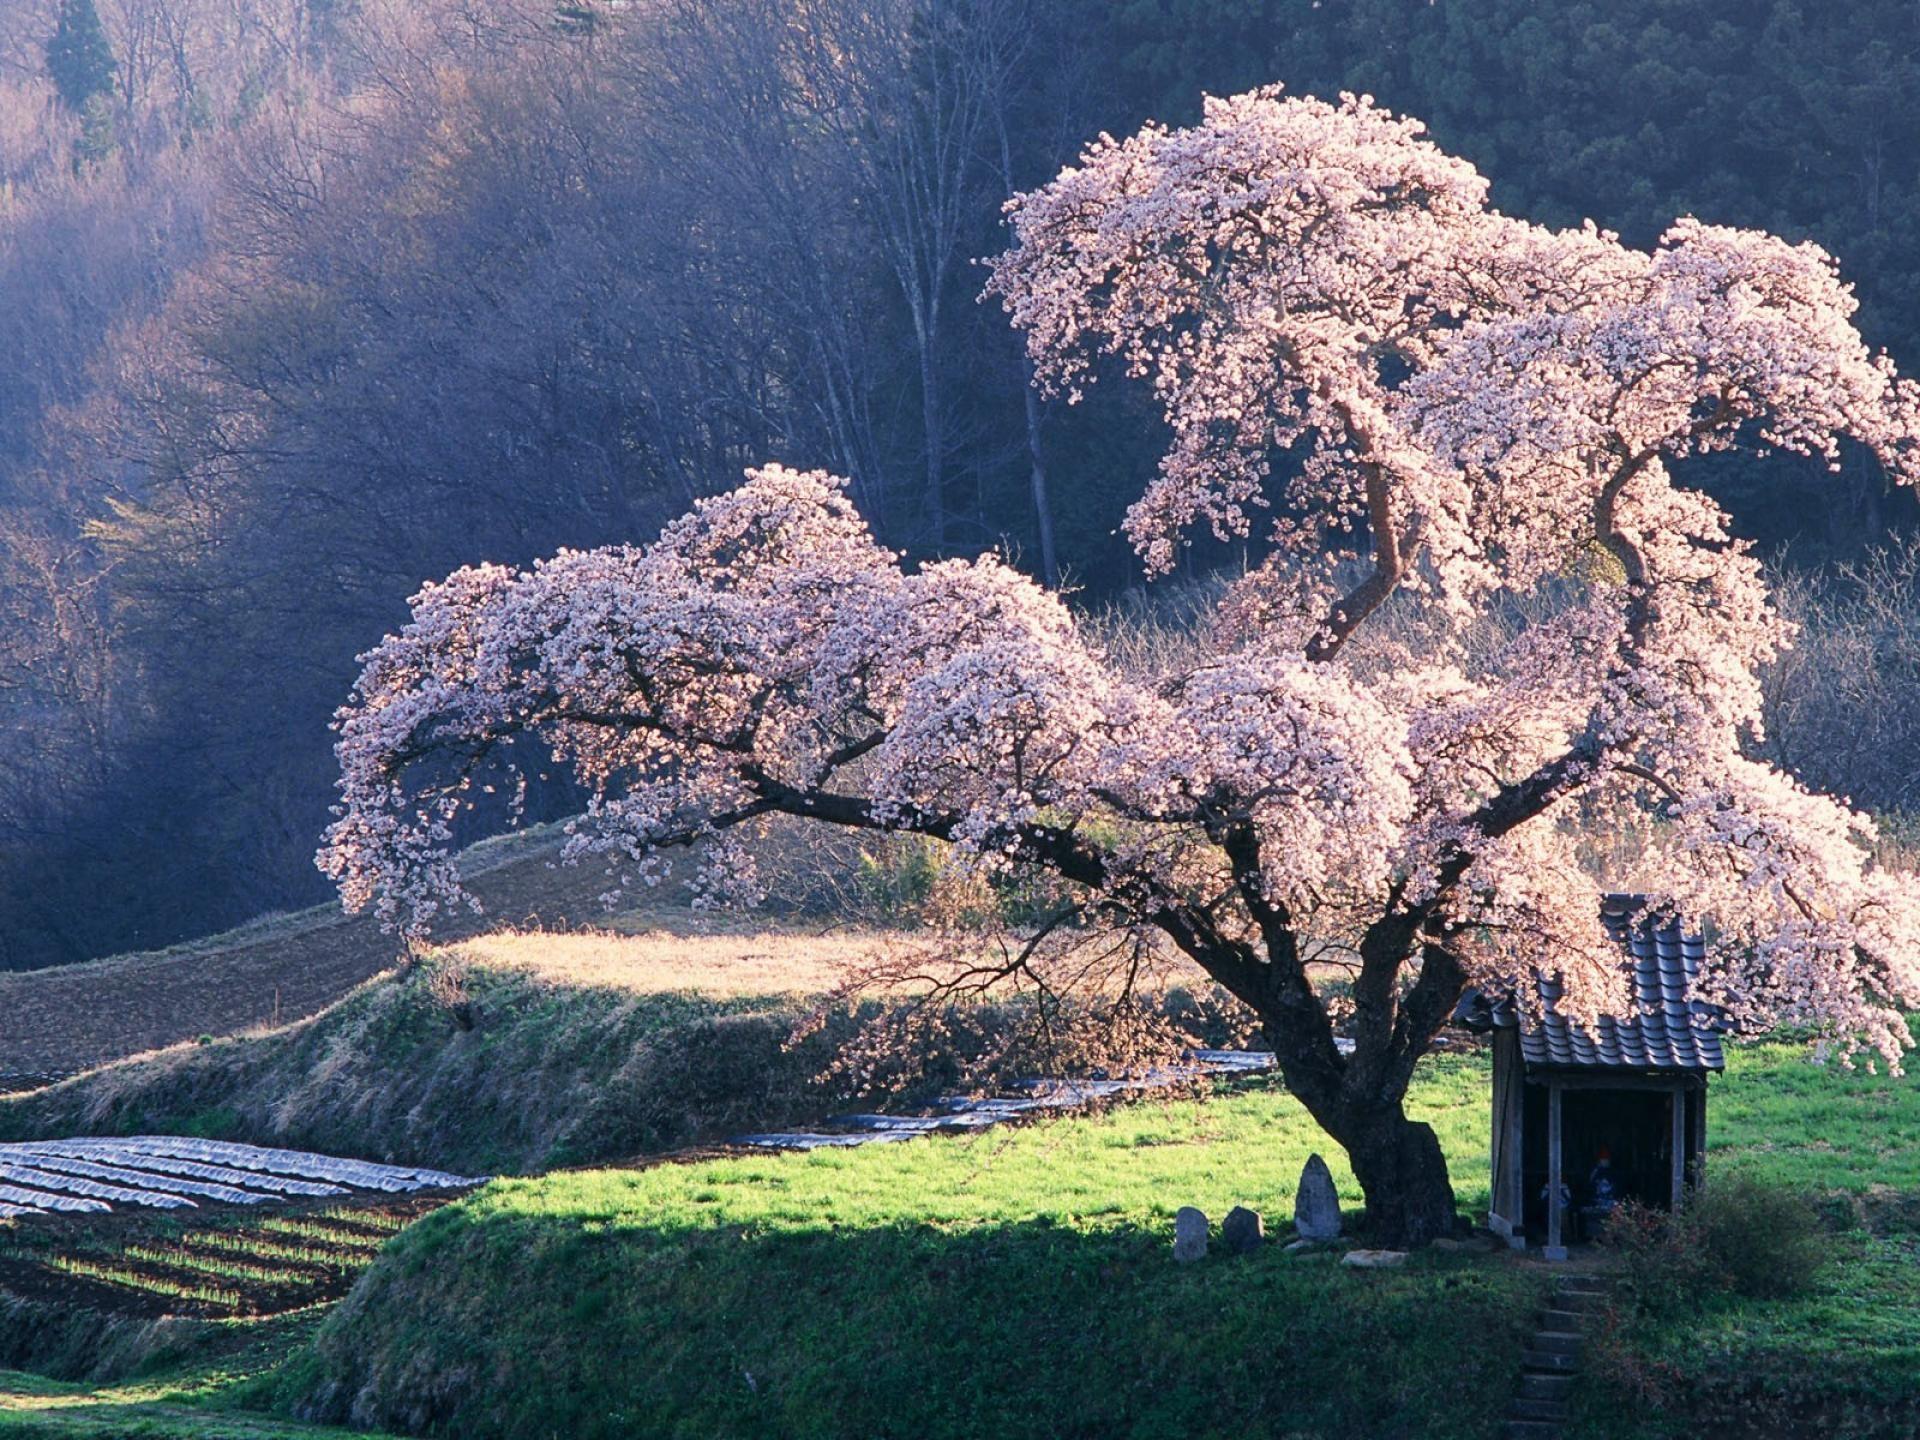 Japanese Cherry Blossoms Tree Blossom Trees Japan Landscape Beautiful Nature